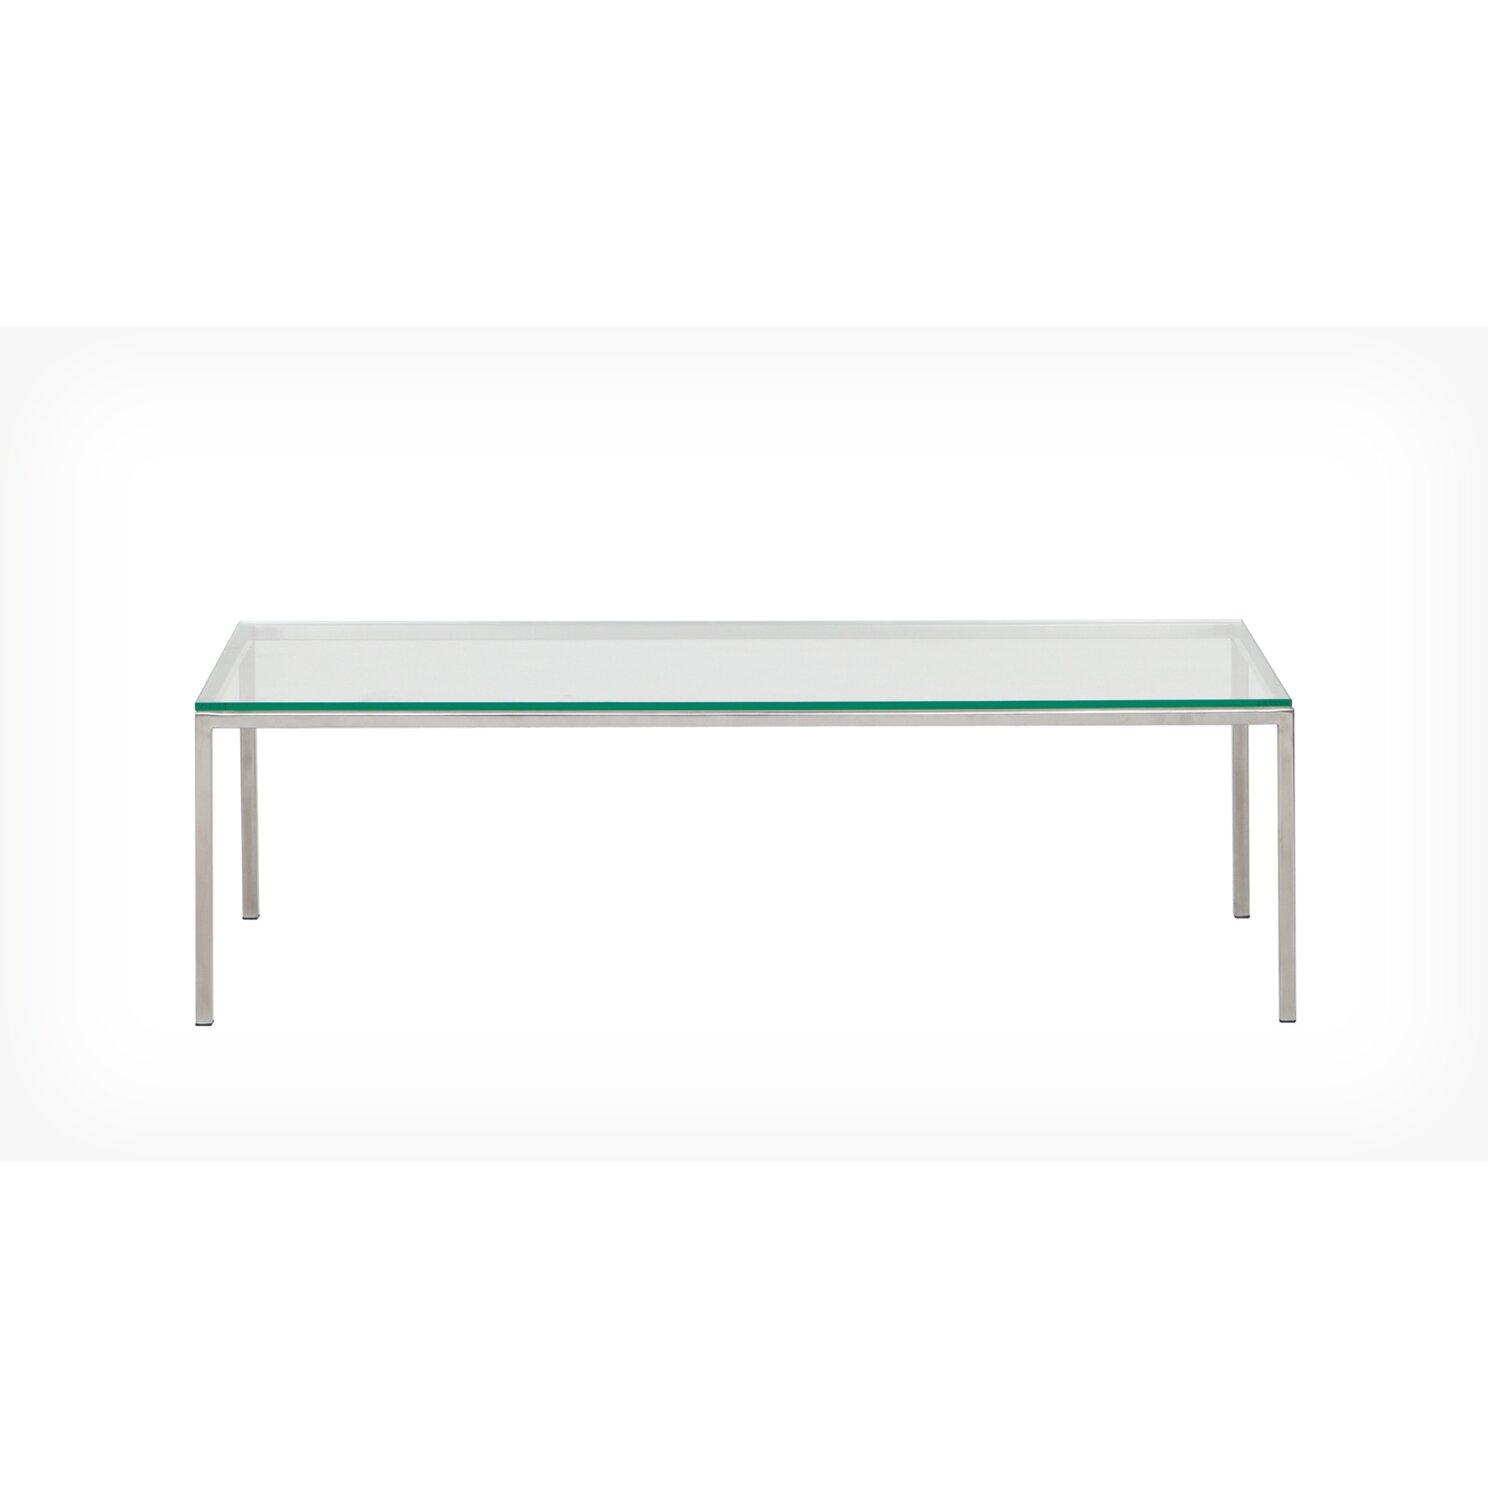 Eq3 Custom Coffee Table